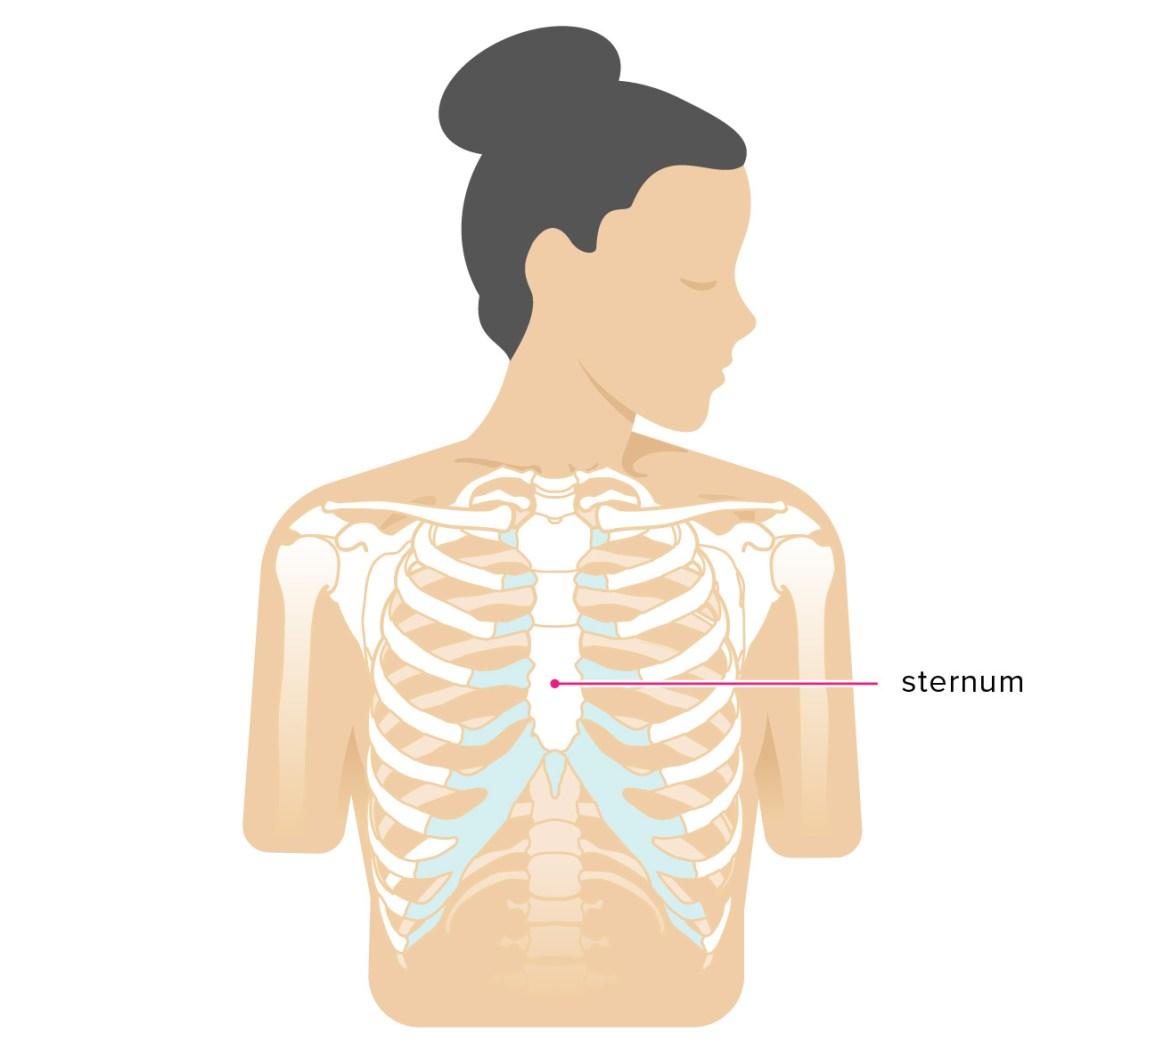 Broken Sternum Symptoms Car Accident Treatment And More